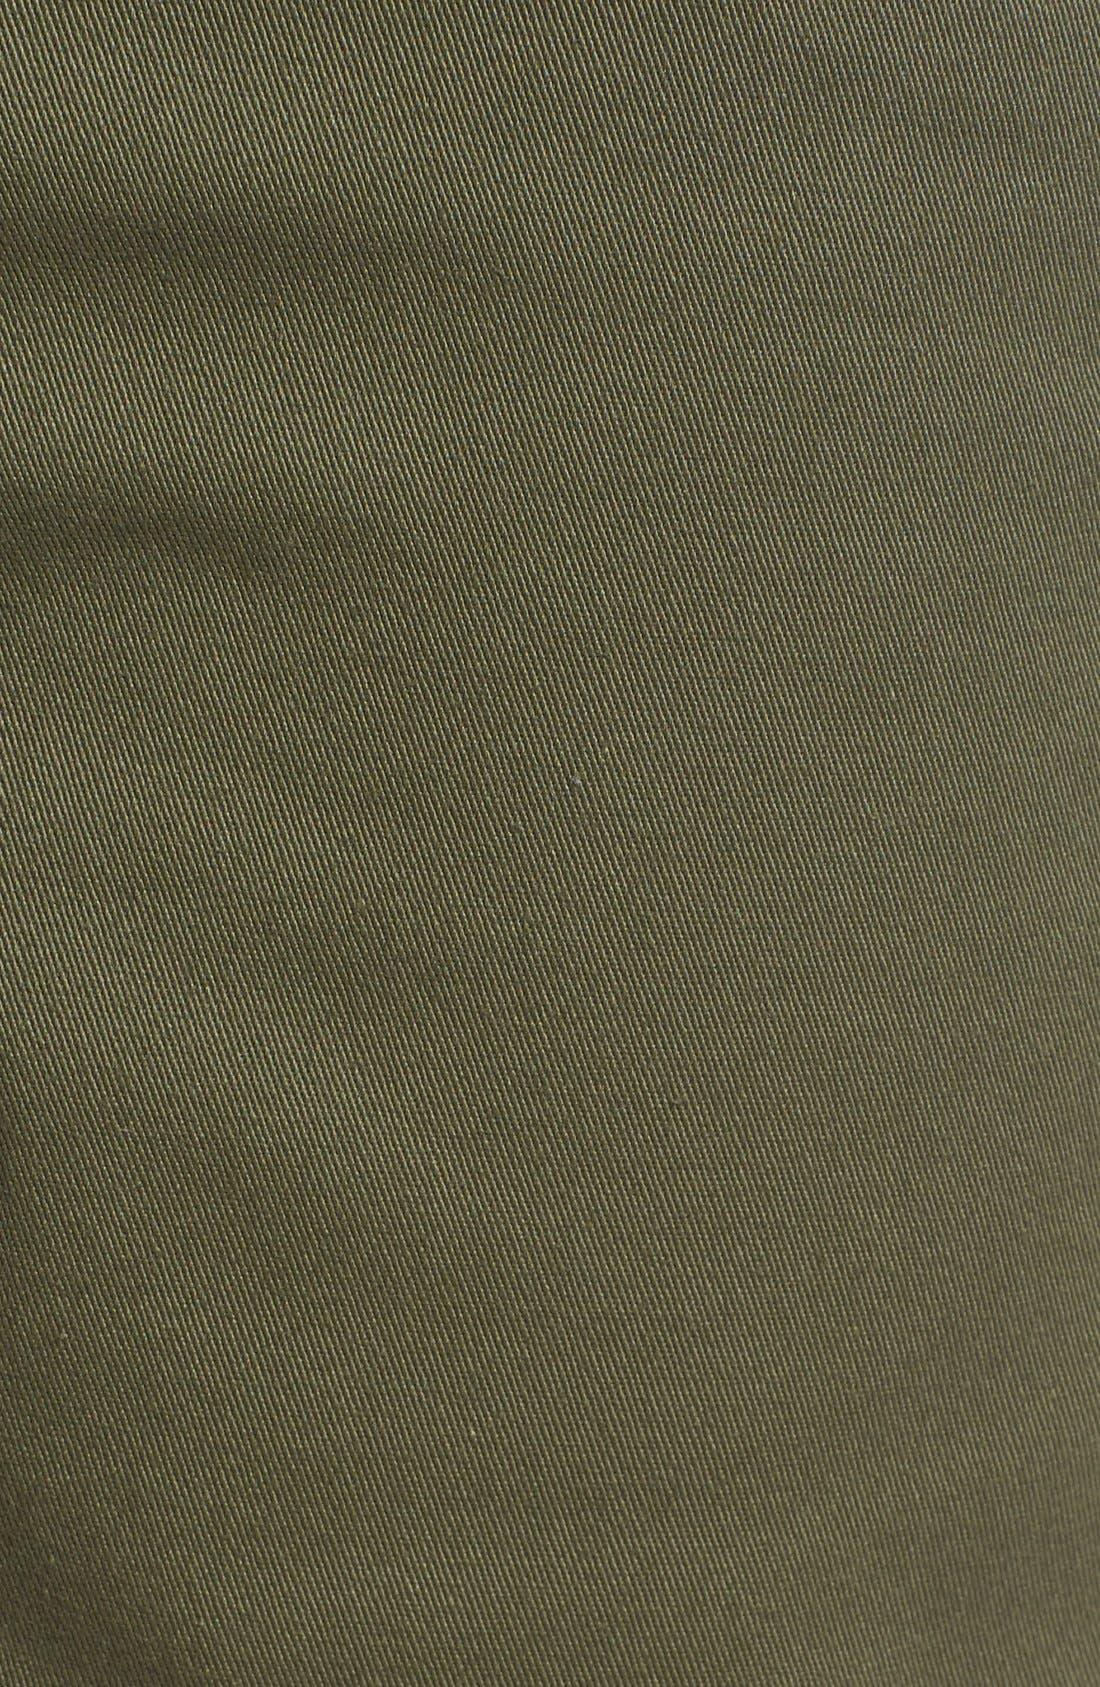 'Covina II - Anthony Van Engelen' Twill Shorts,                             Alternate thumbnail 5, color,                             Grape Leaf